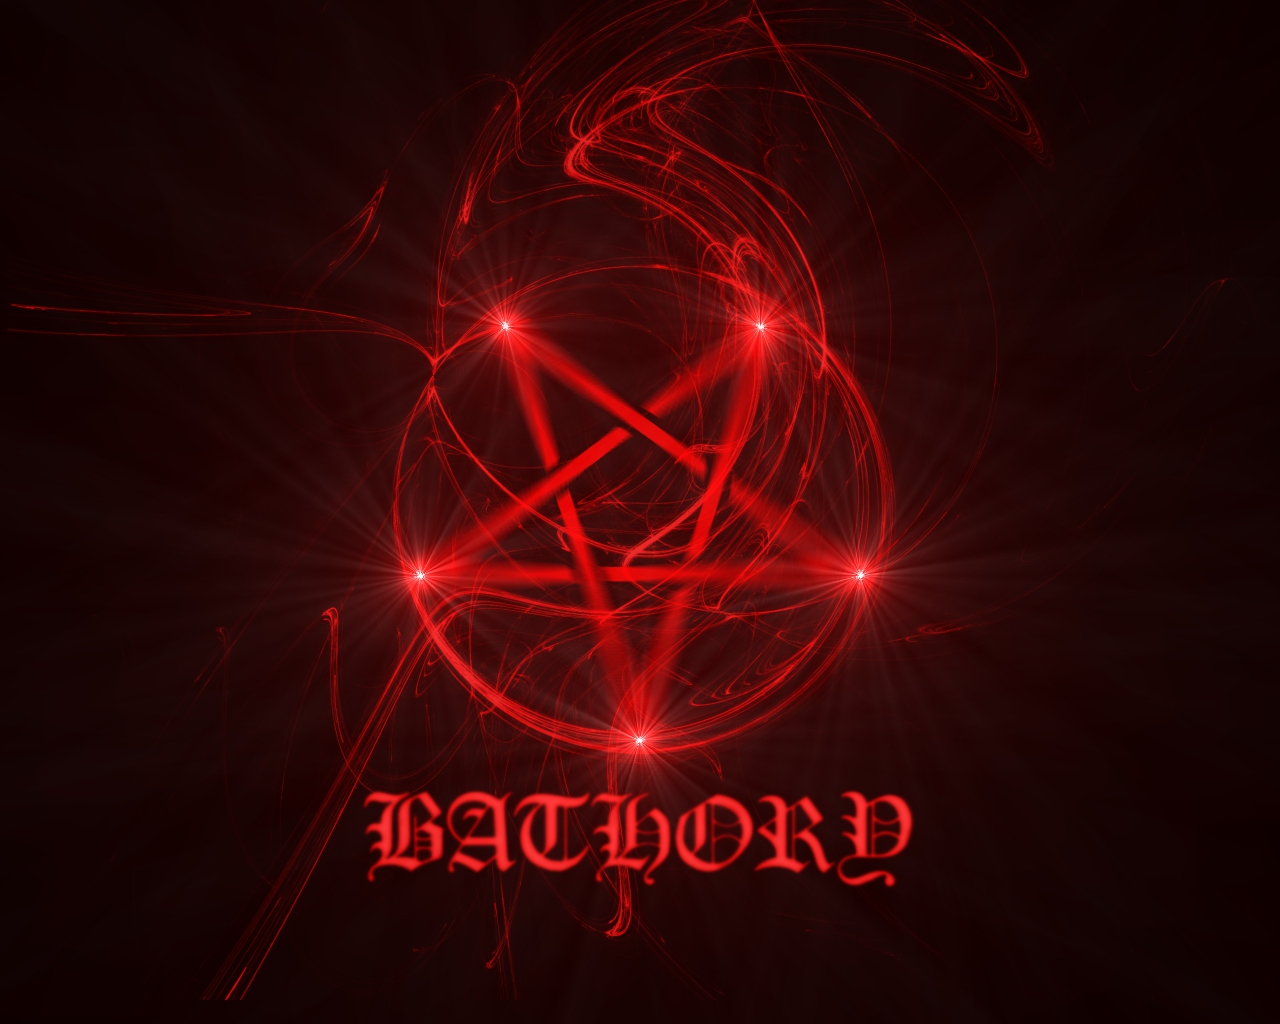 Bathory Band Wallpaper by jaime2psp on DeviantArt